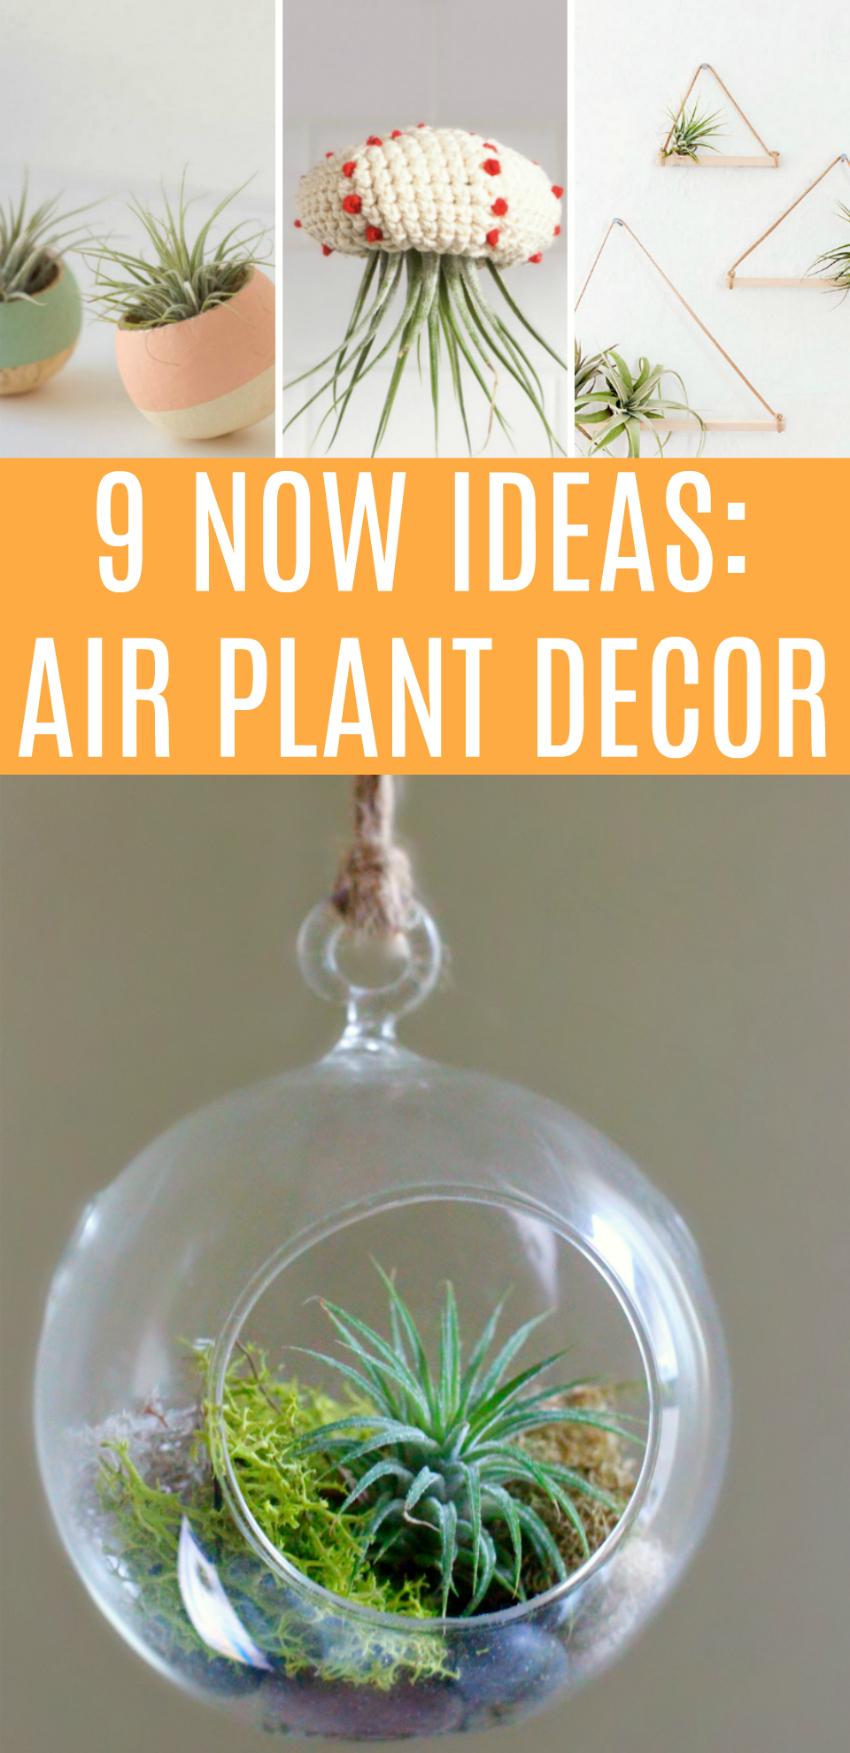 9 Now Ideas for Air Plant Decor